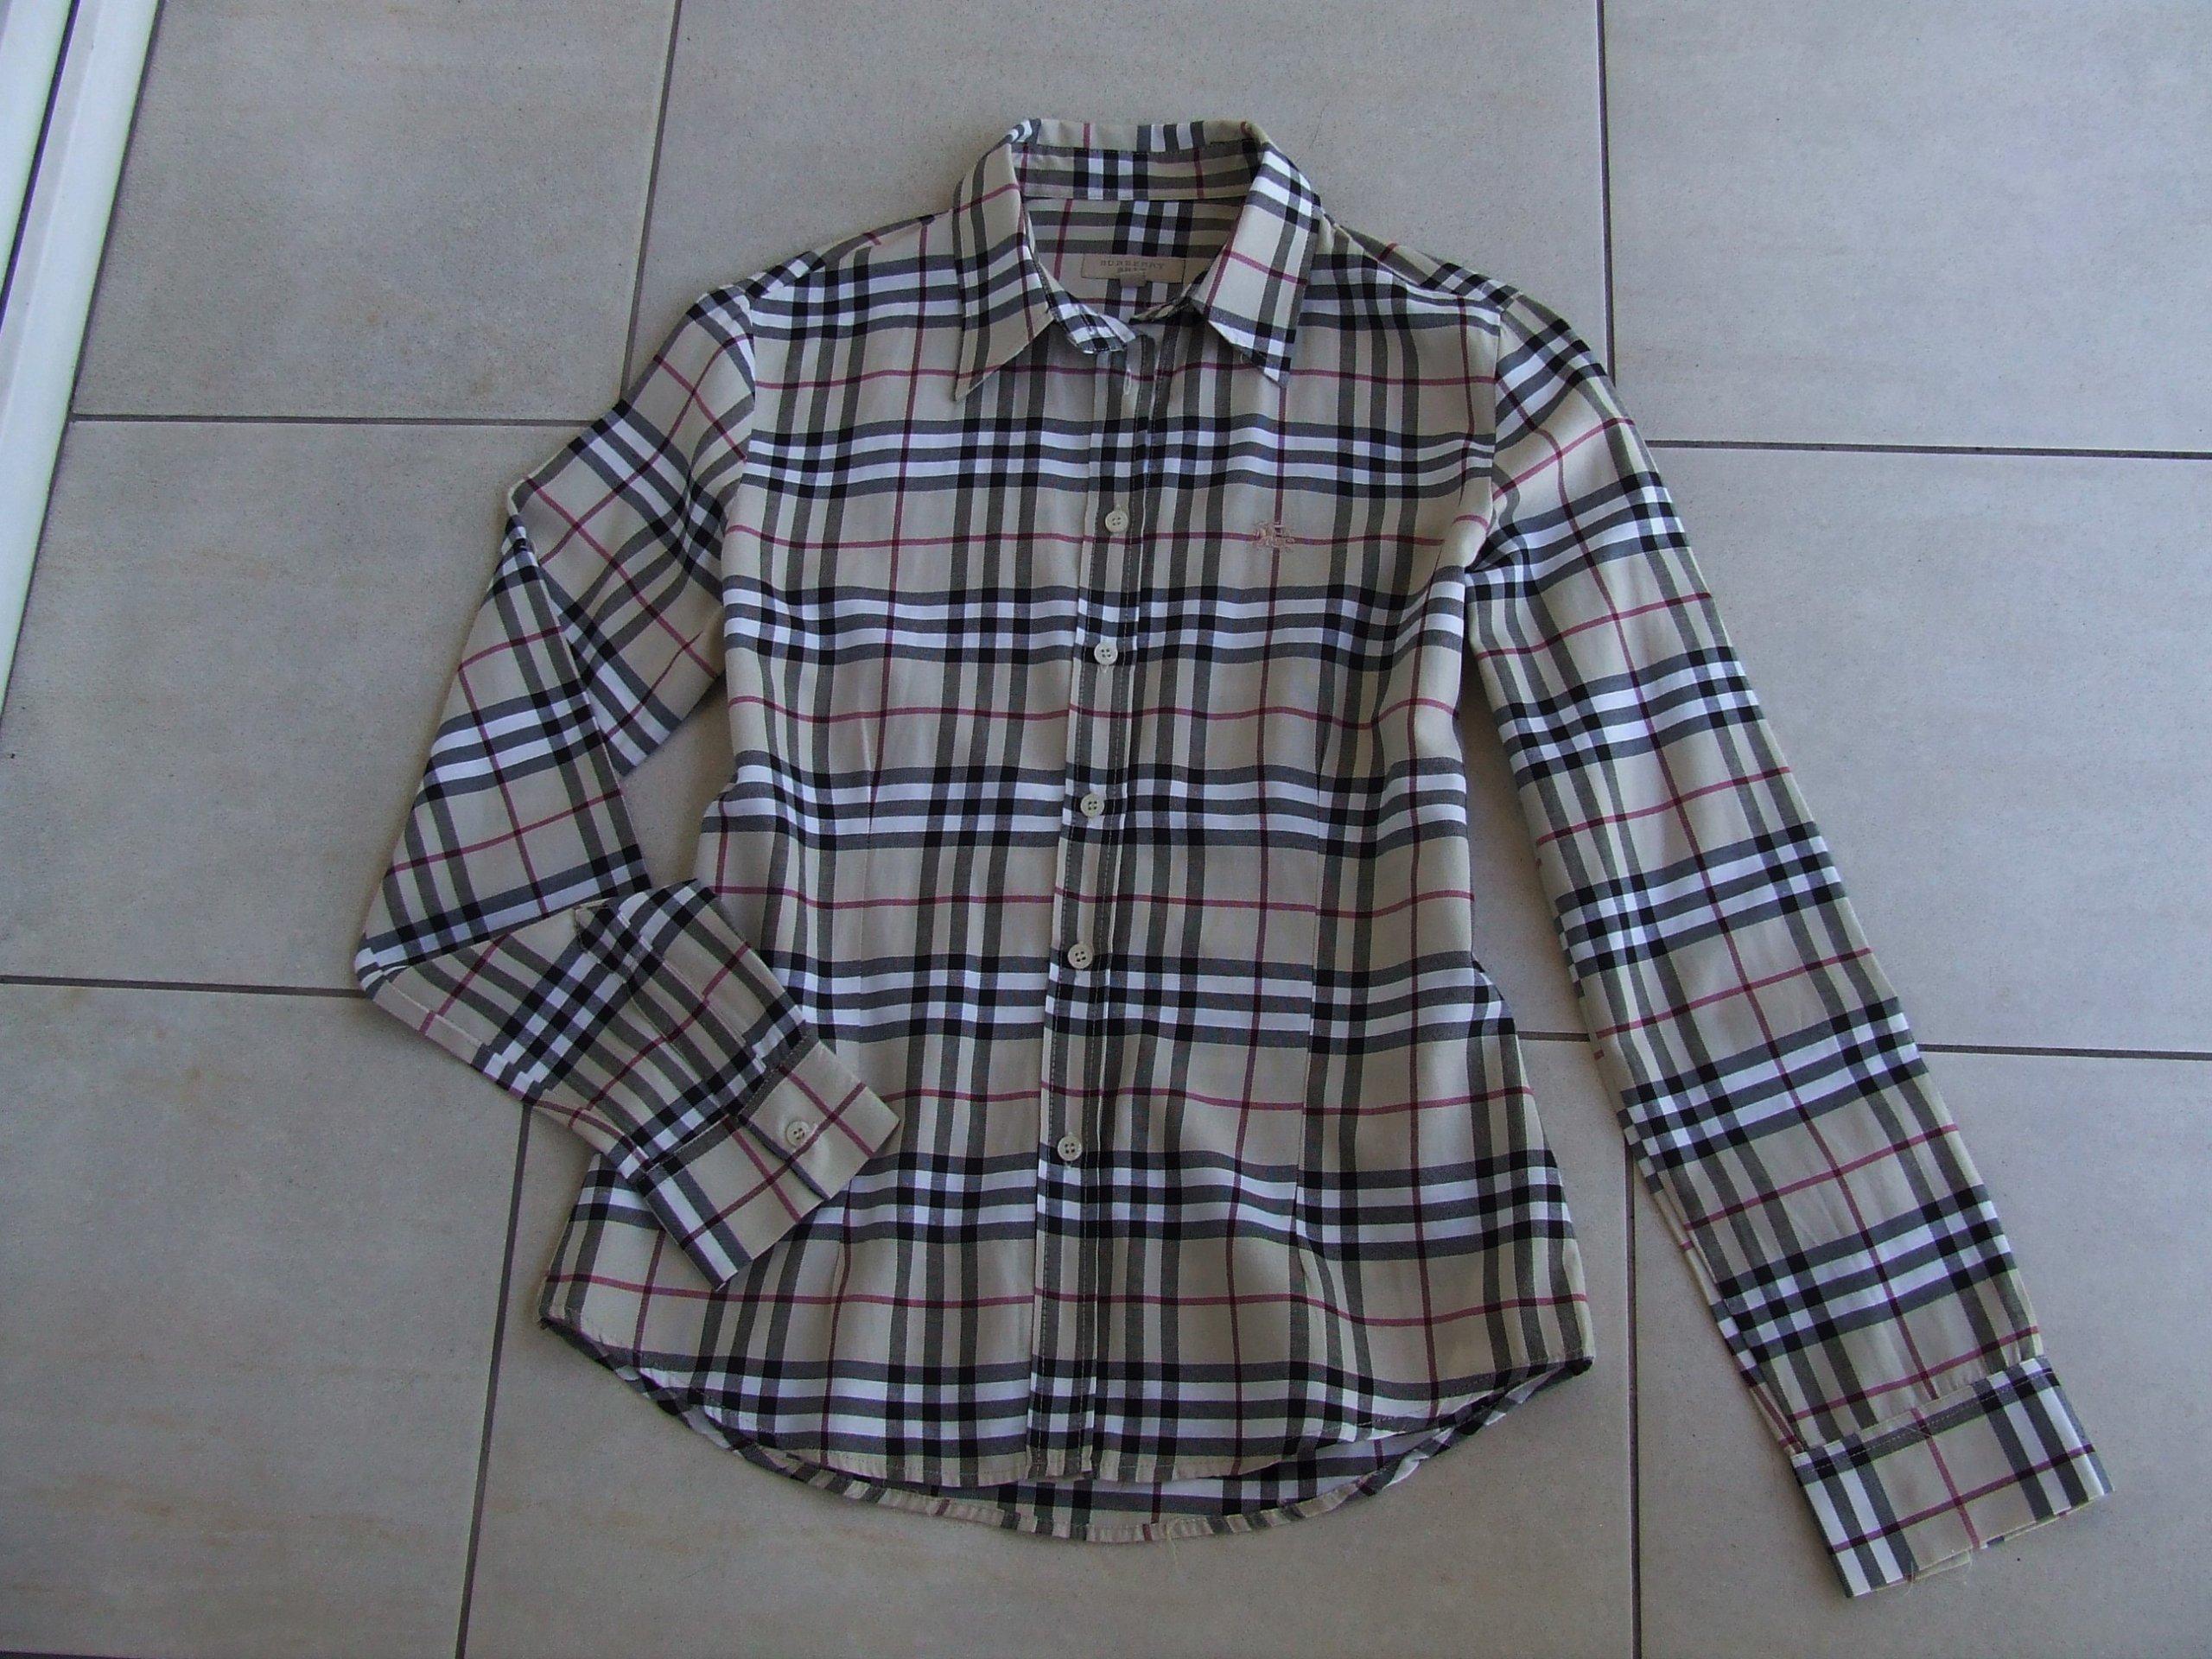 896bcb64d BURBERRY kultowa koszula 38/40 bawełna NOWA cudna - 7384603959 ...